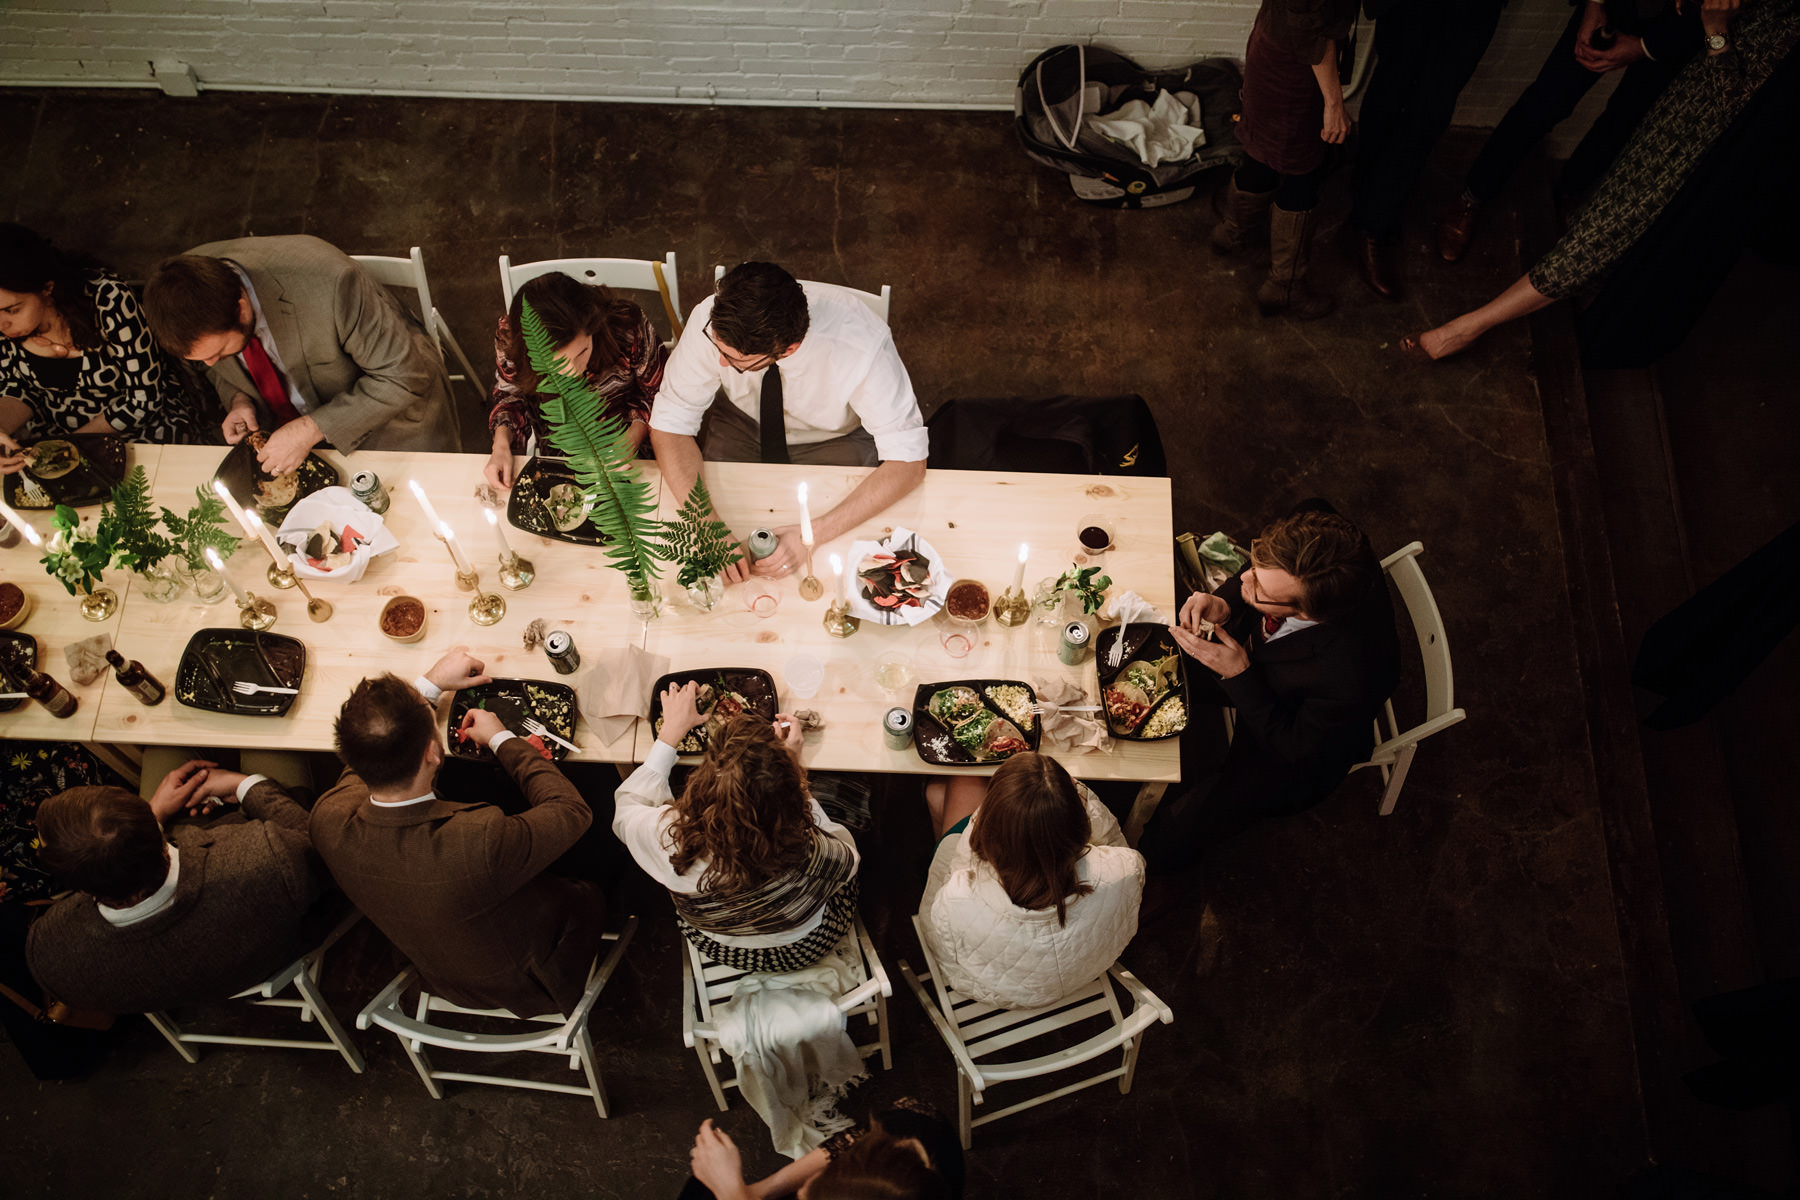 Memorial Presbyterian Wedding in St. Louis Missouri_Kindling Wedding Photography053.JPG